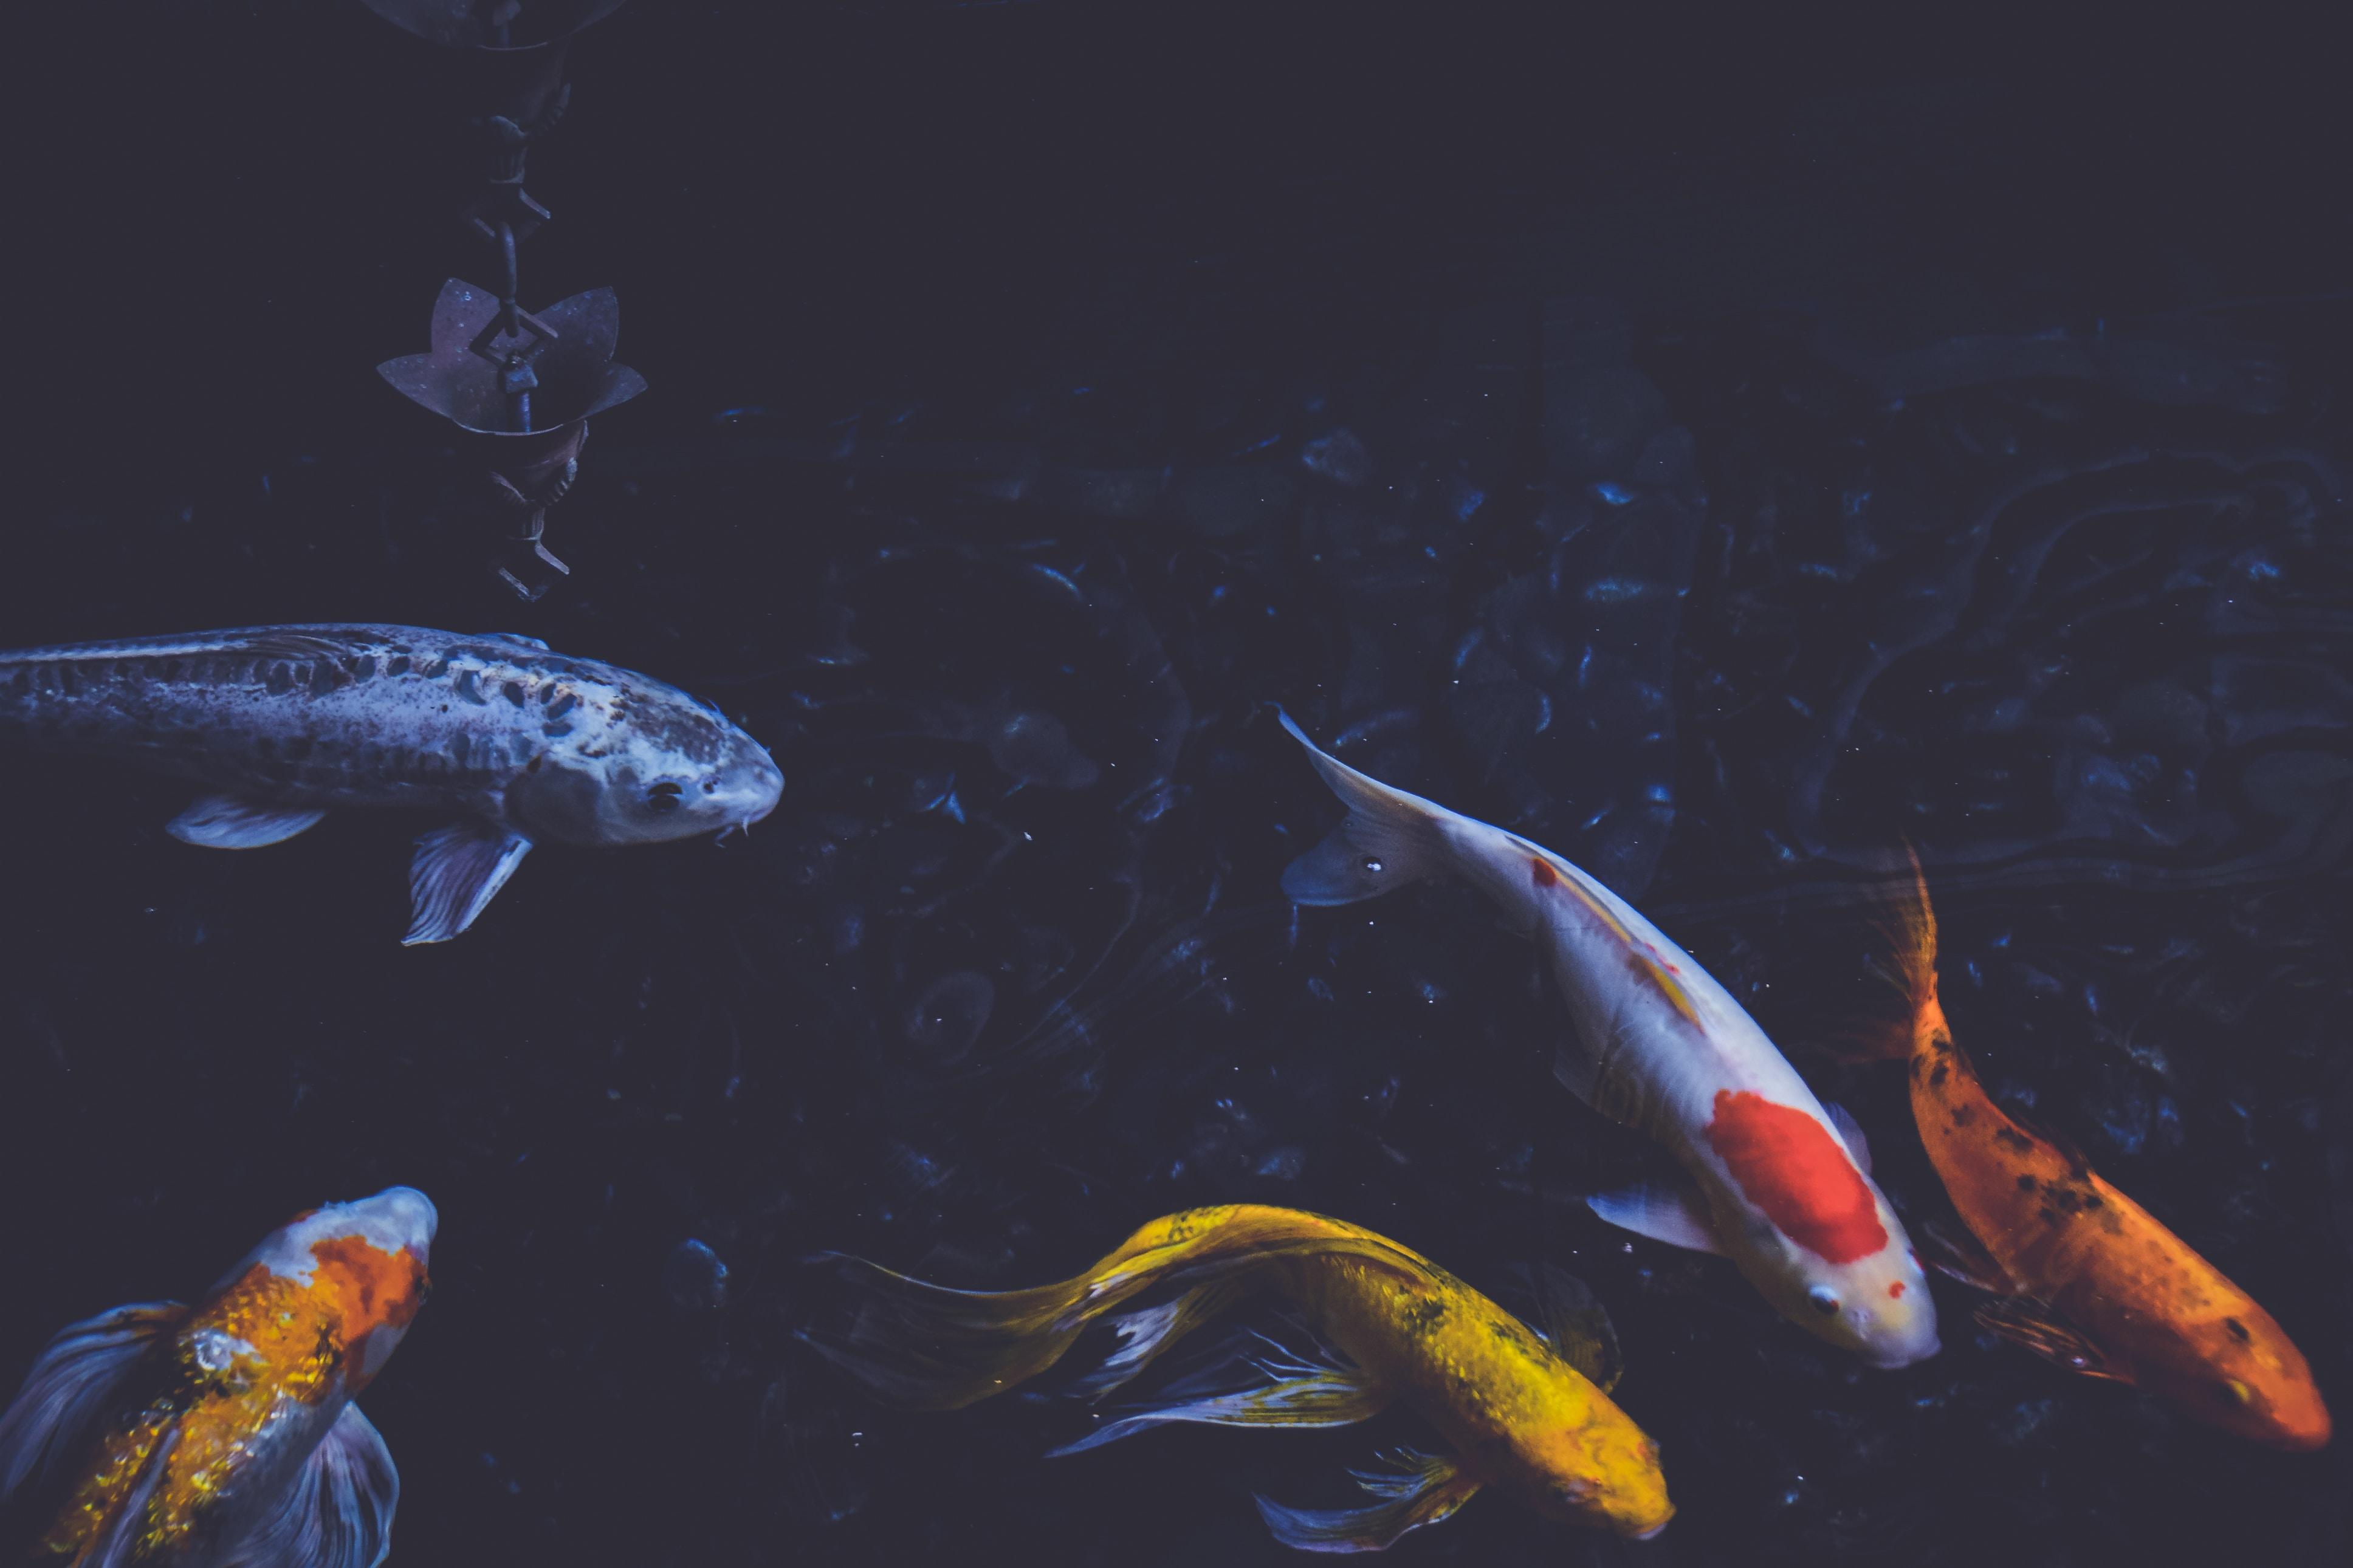 Orange, black, white, and yellow Koi fish swimming in a pond